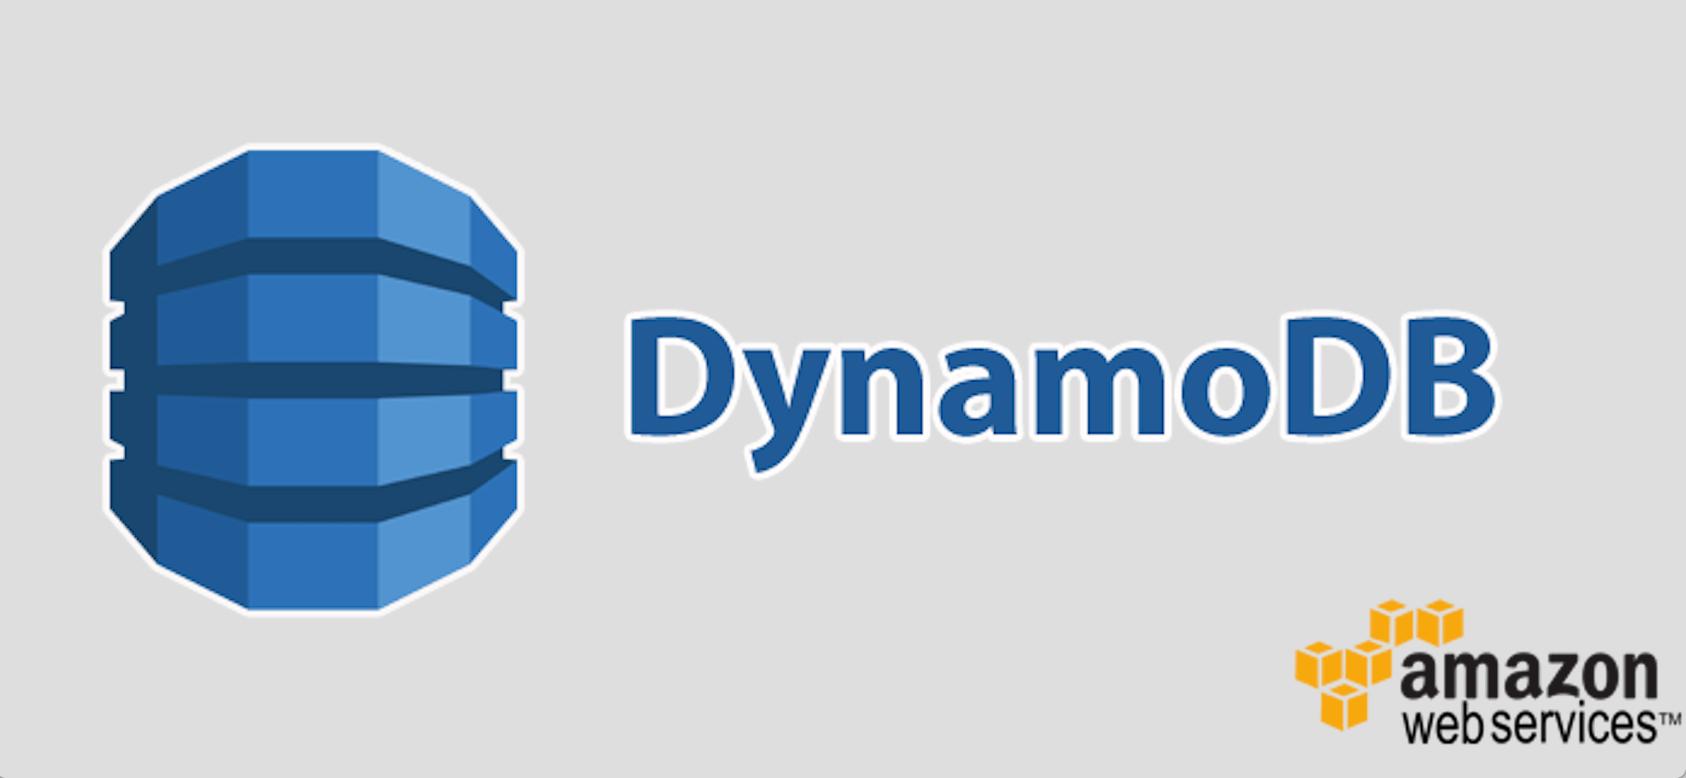 Amazon DynamoDB,为企业助力的强大功能